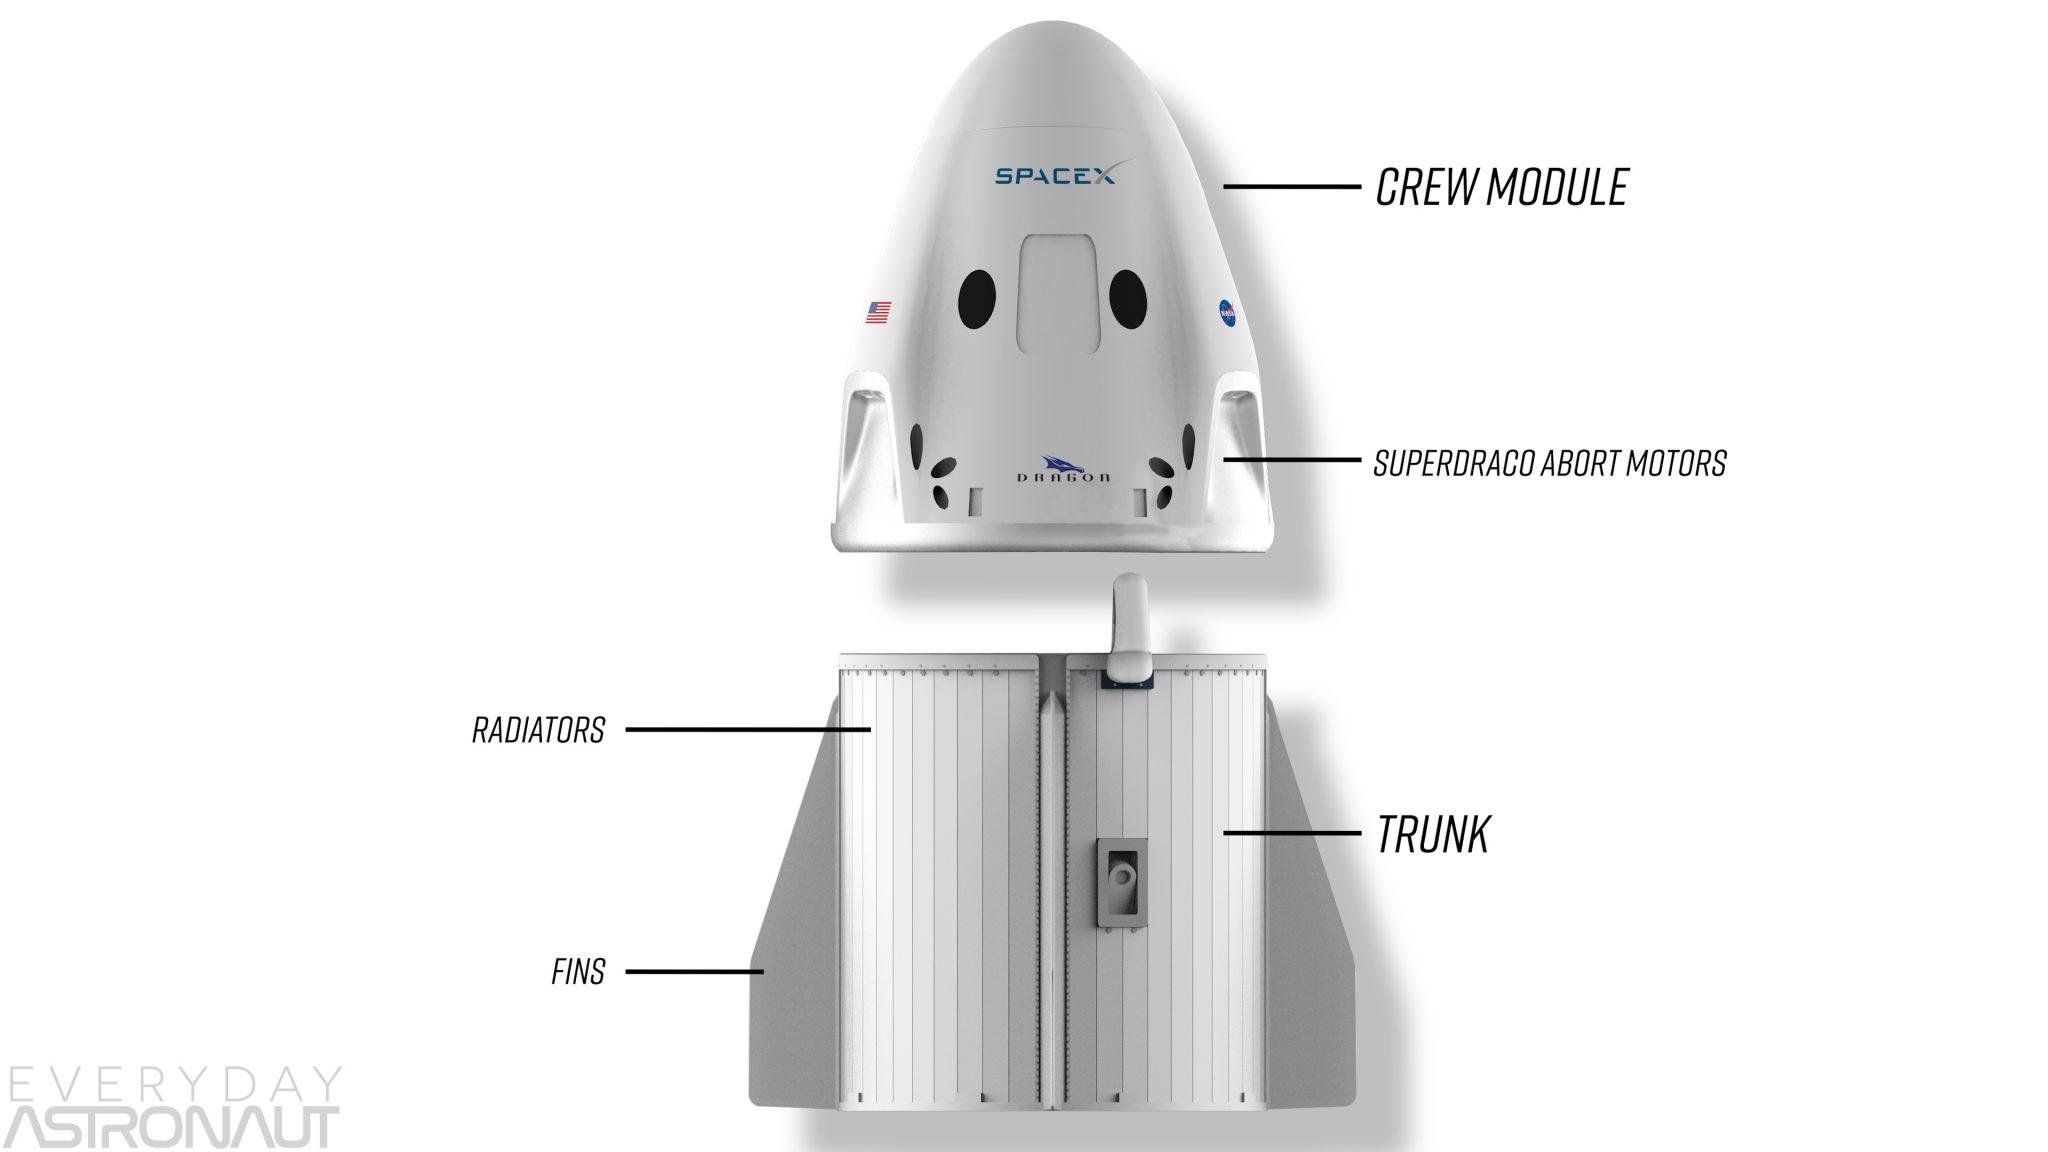 https://www.elonx.cz/wp-content/uploads/2019/10/SpaceX-Crew-Dragon-Parts.jpg